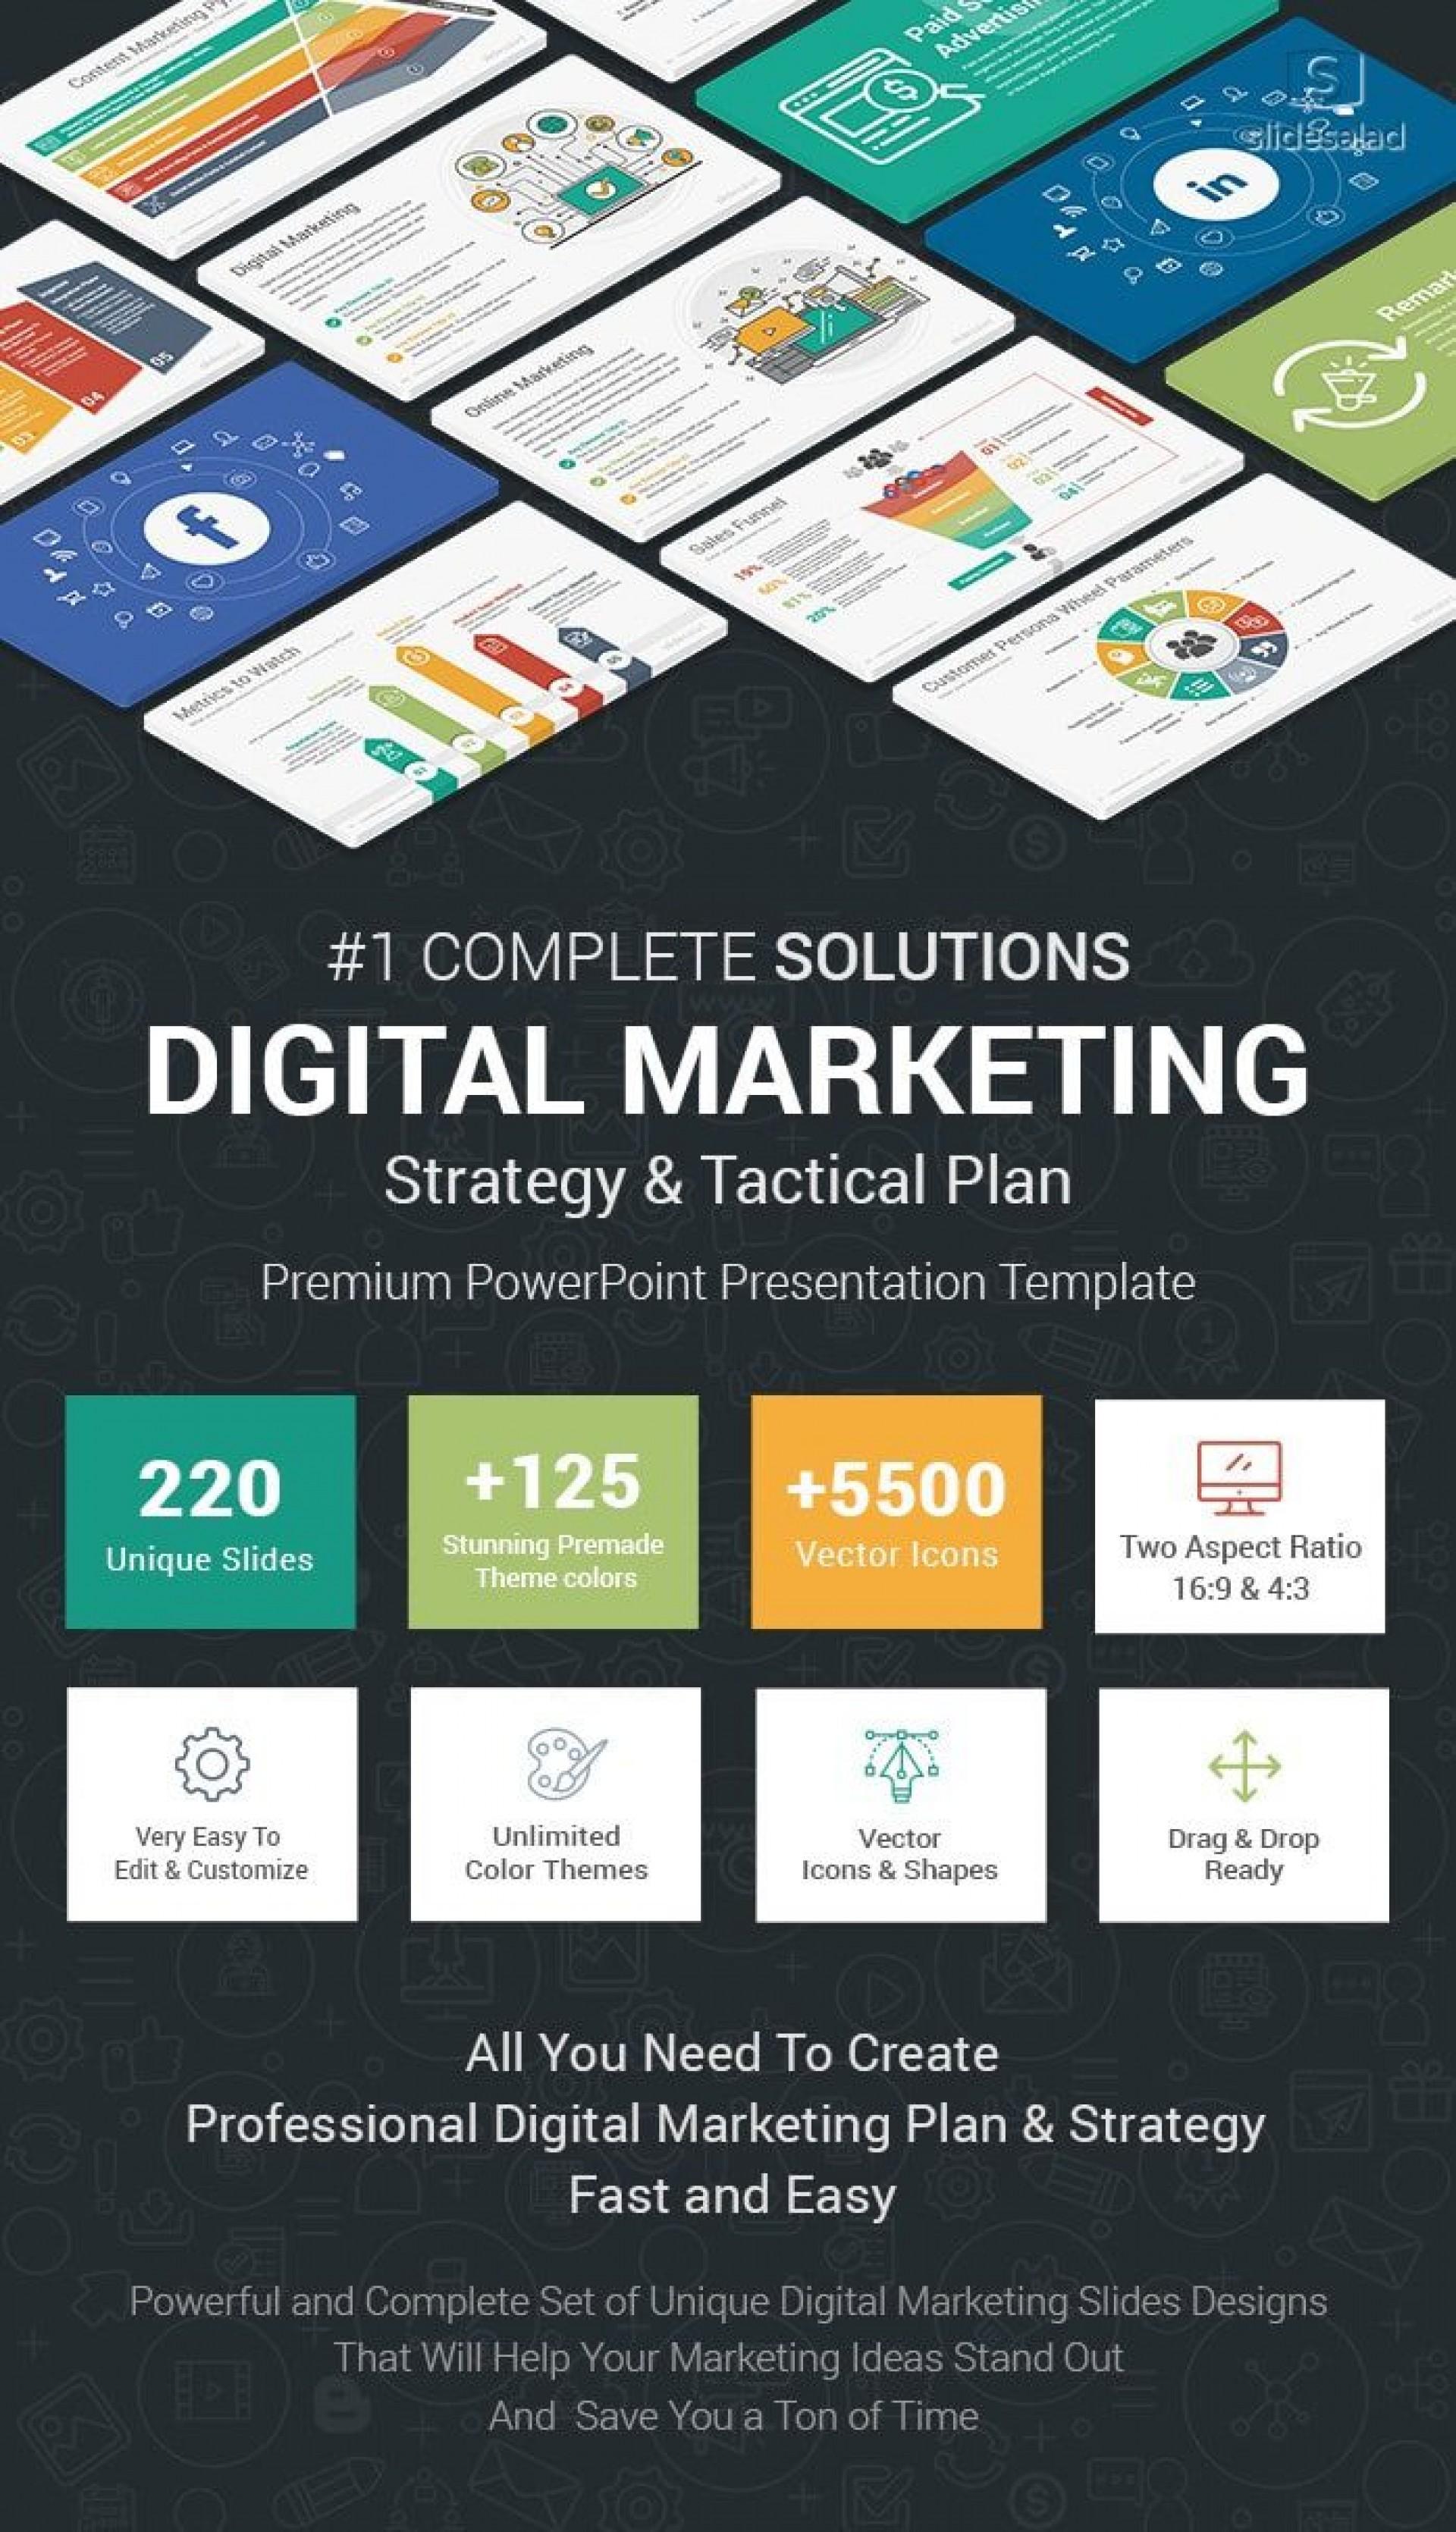 007 Impressive Digital Marketing Plan Example Ppt High Resolution 1920